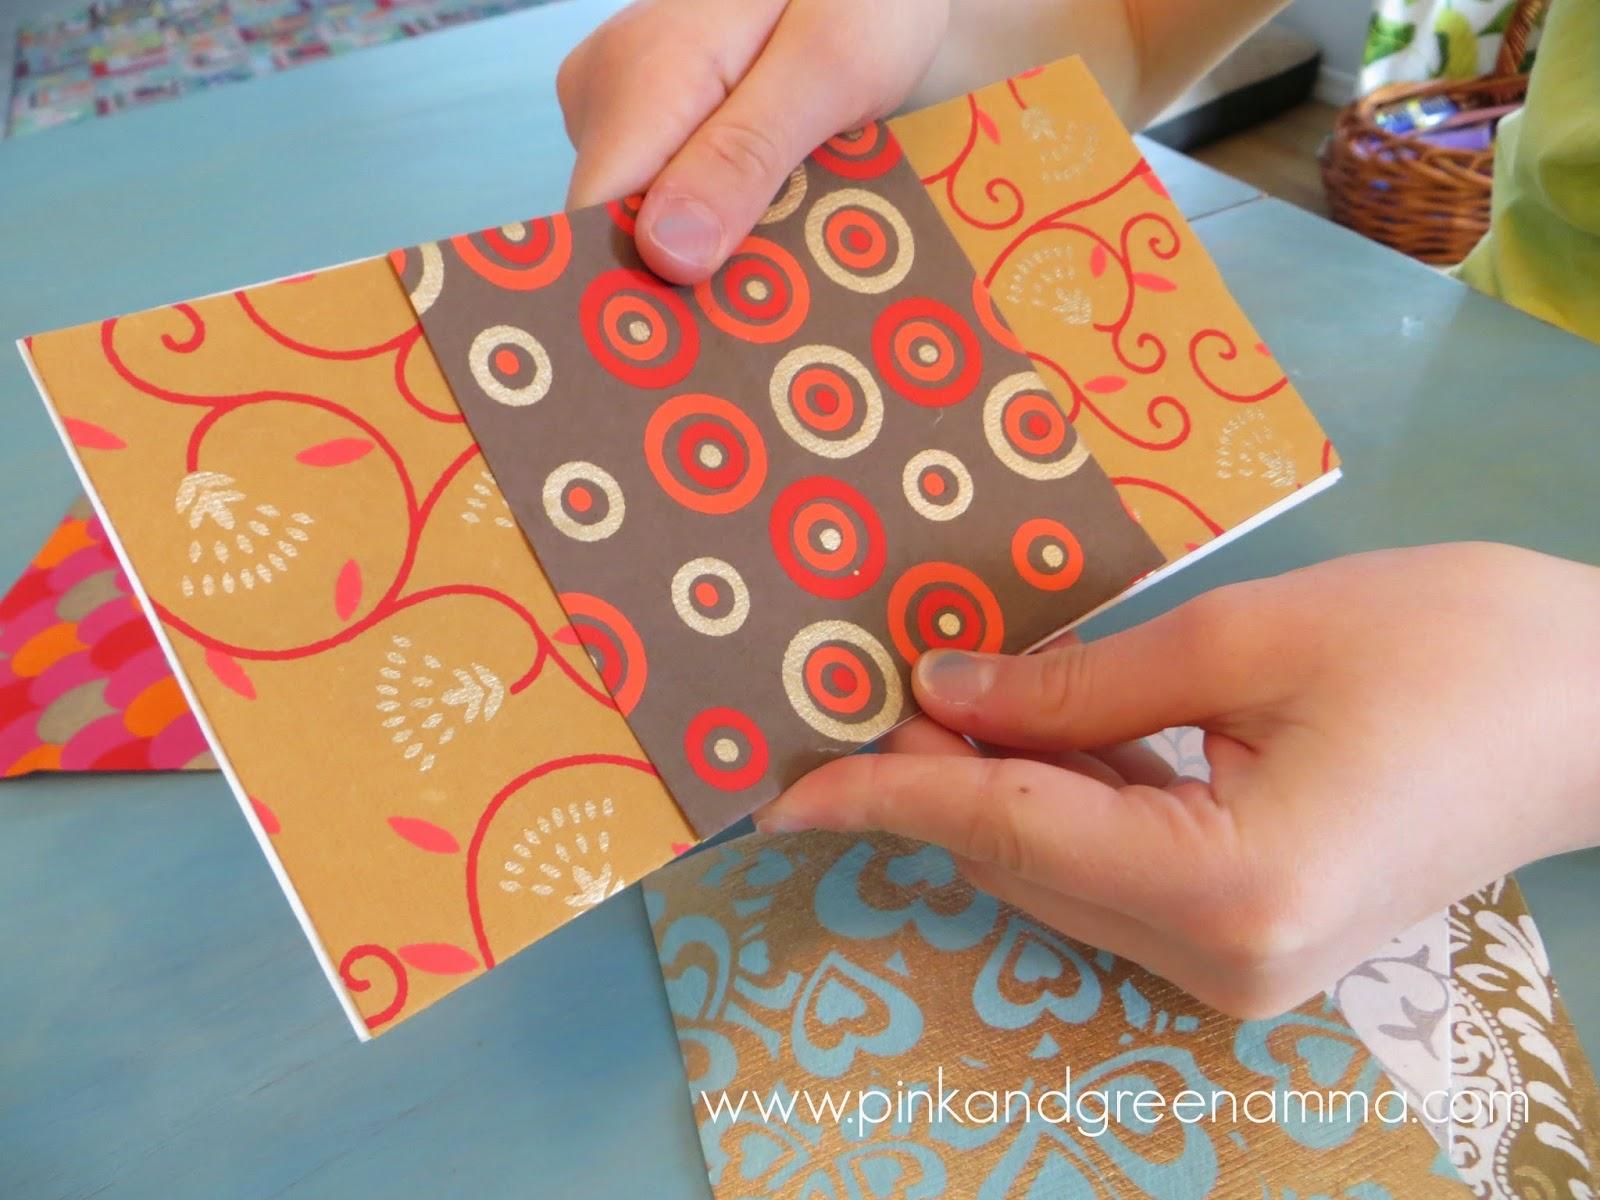 Craft kits for 3 year olds - Craft Kits For 8 Year Olds Girls Arts And Crafts Arts And Craft Kit Girls